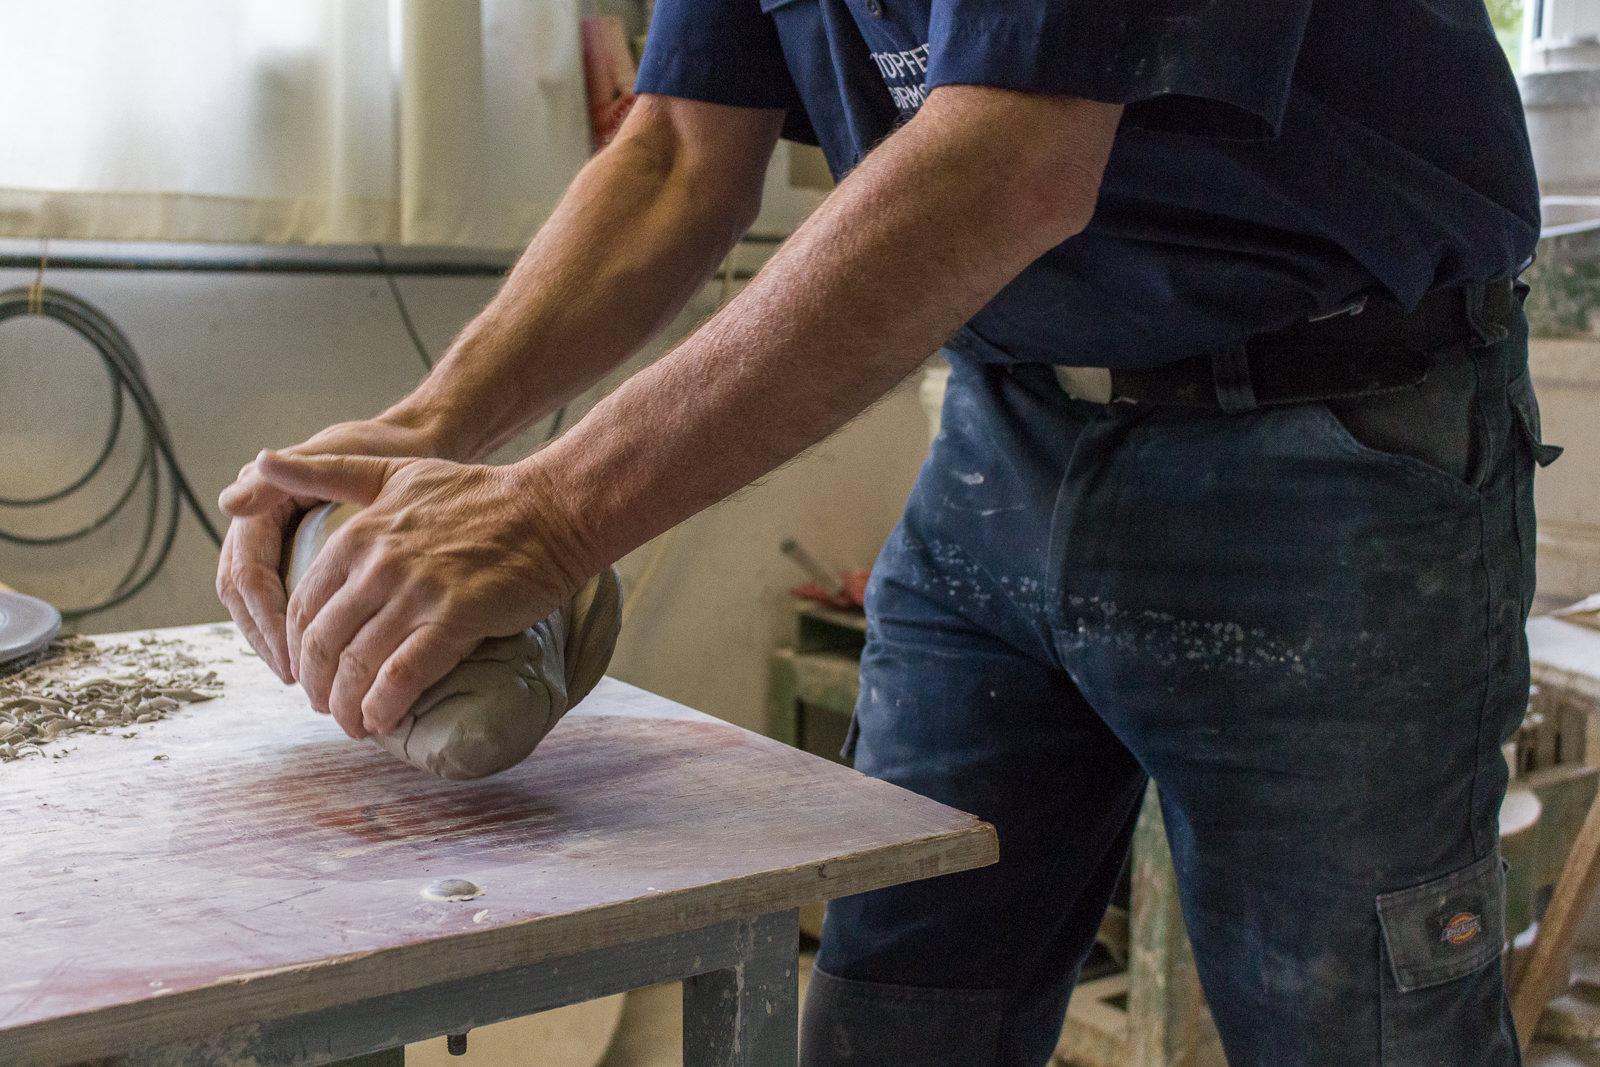 kannenbäckerland, #visitkeramik, Höhr-Grenzhausen, #RLPerleben, Ton, Keramik, Keramikkunst, Künstler, Manufaktur, Girmscheid Töpferei